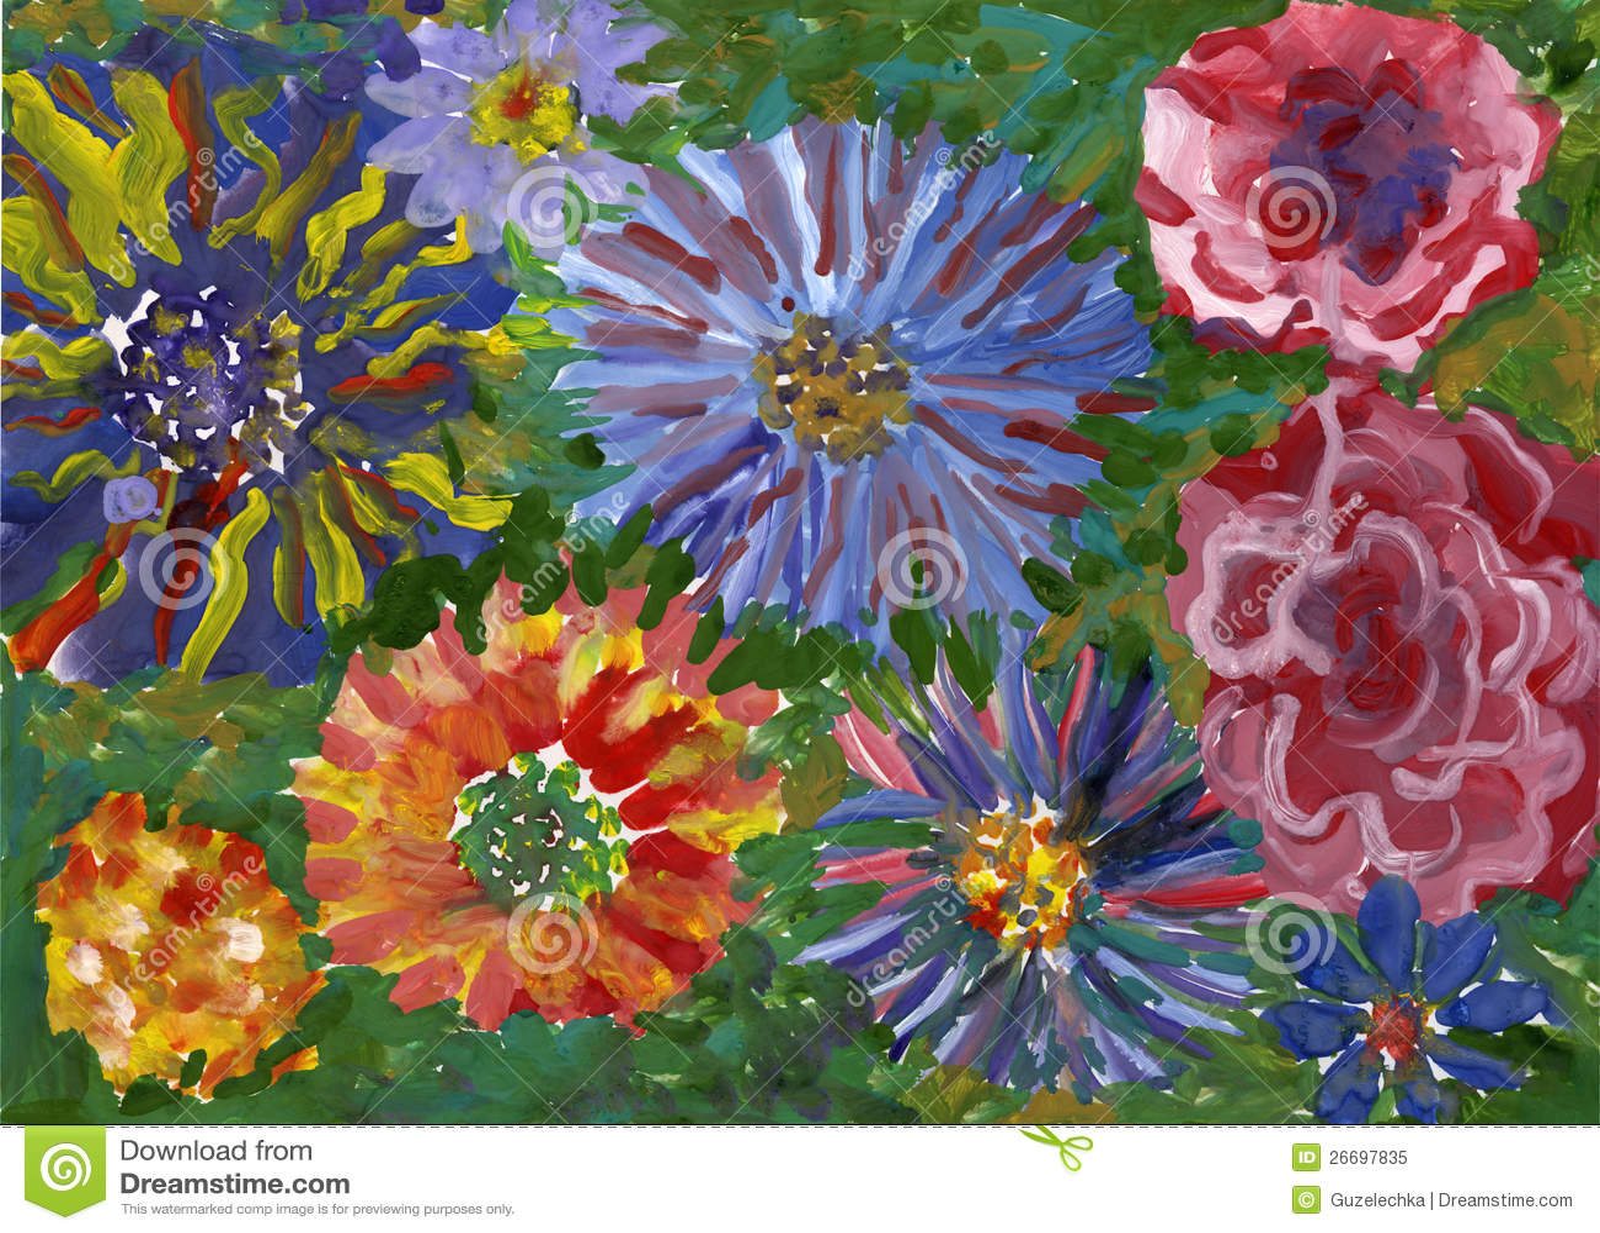 Flowers gouache painting